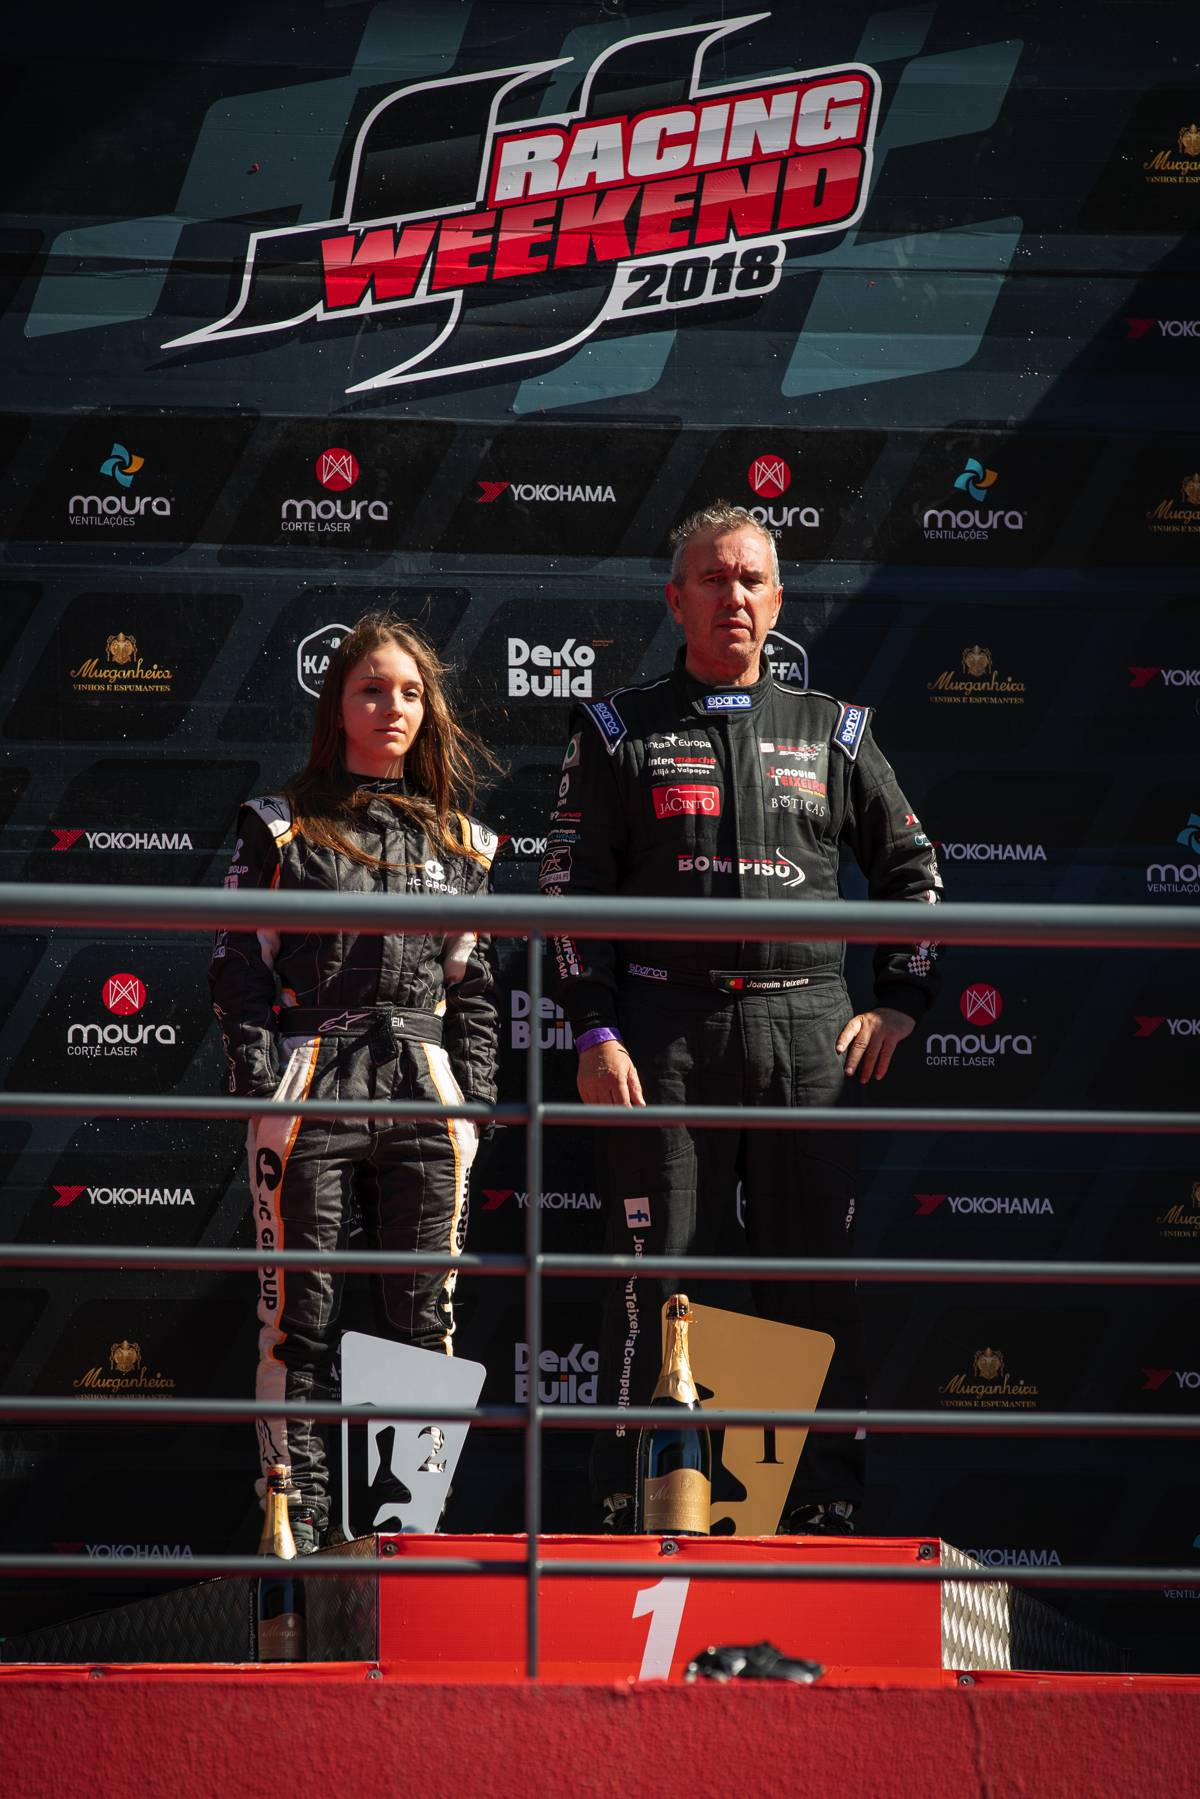 portimao podio supercars turismos